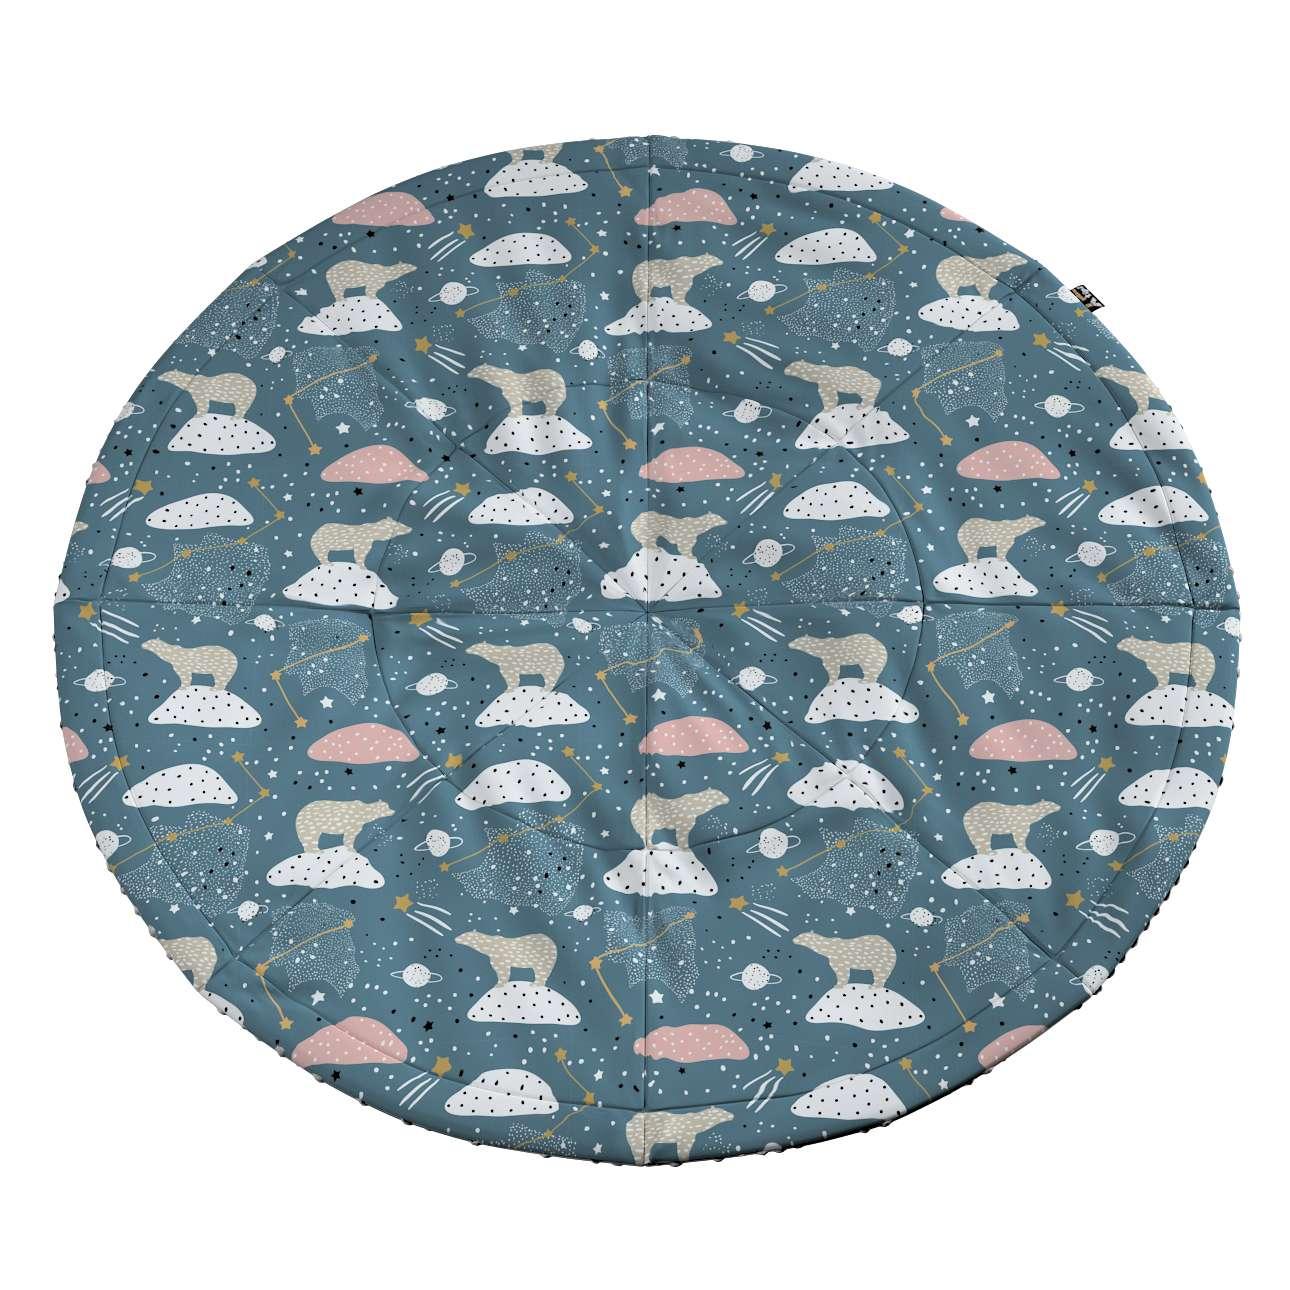 Apvalus kilimėlis kolekcijoje Magic Collection, audinys: 500-45